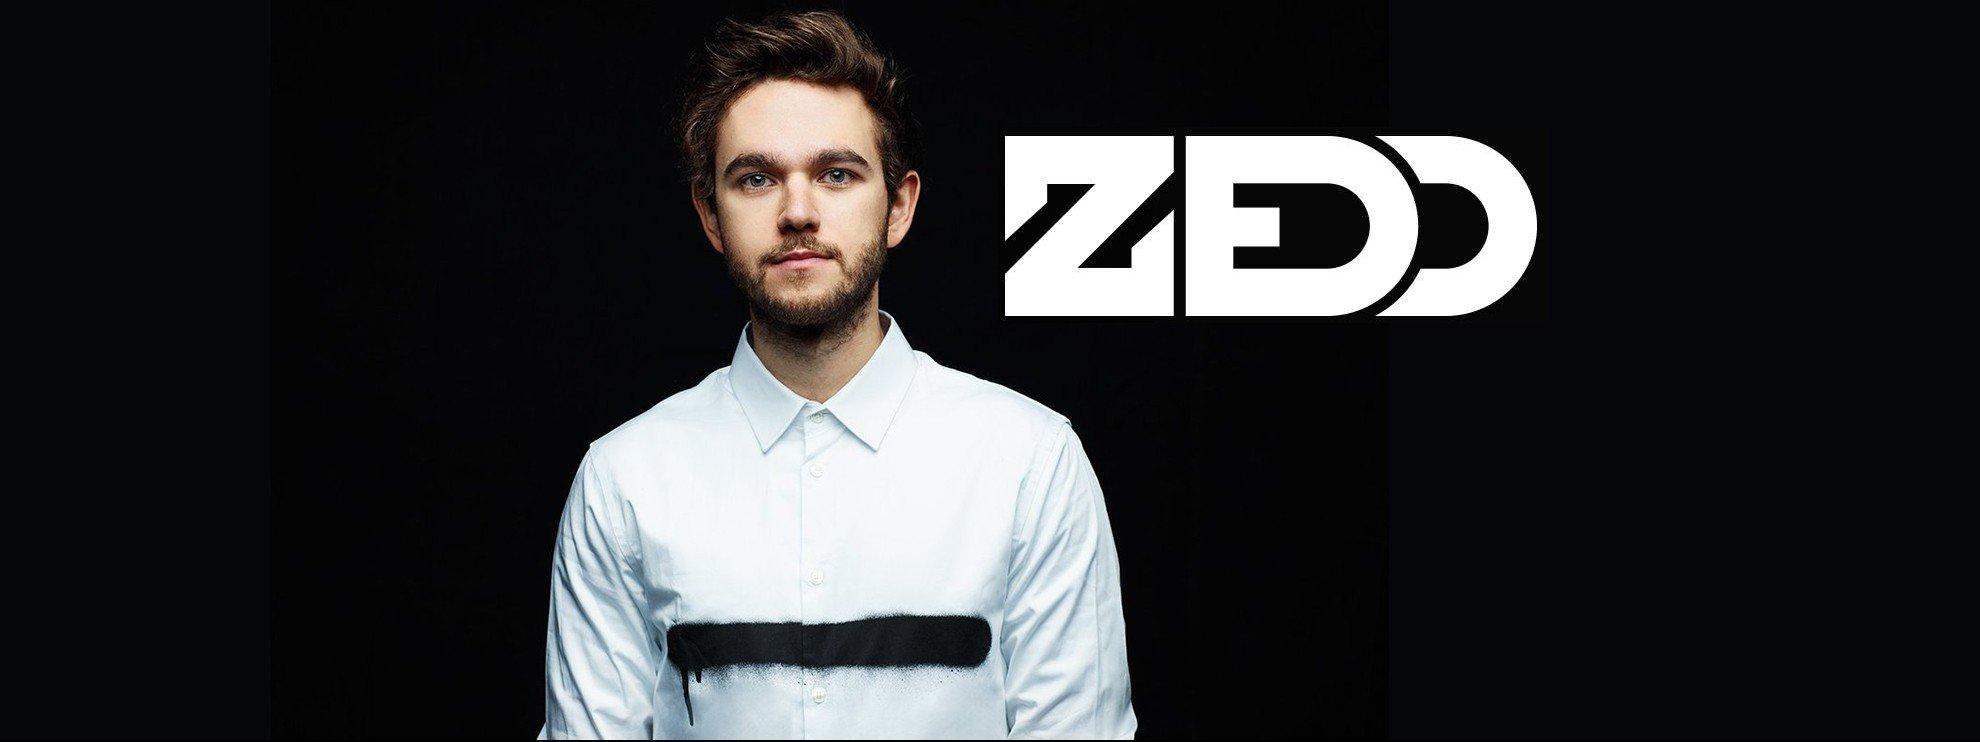 performer Zedd